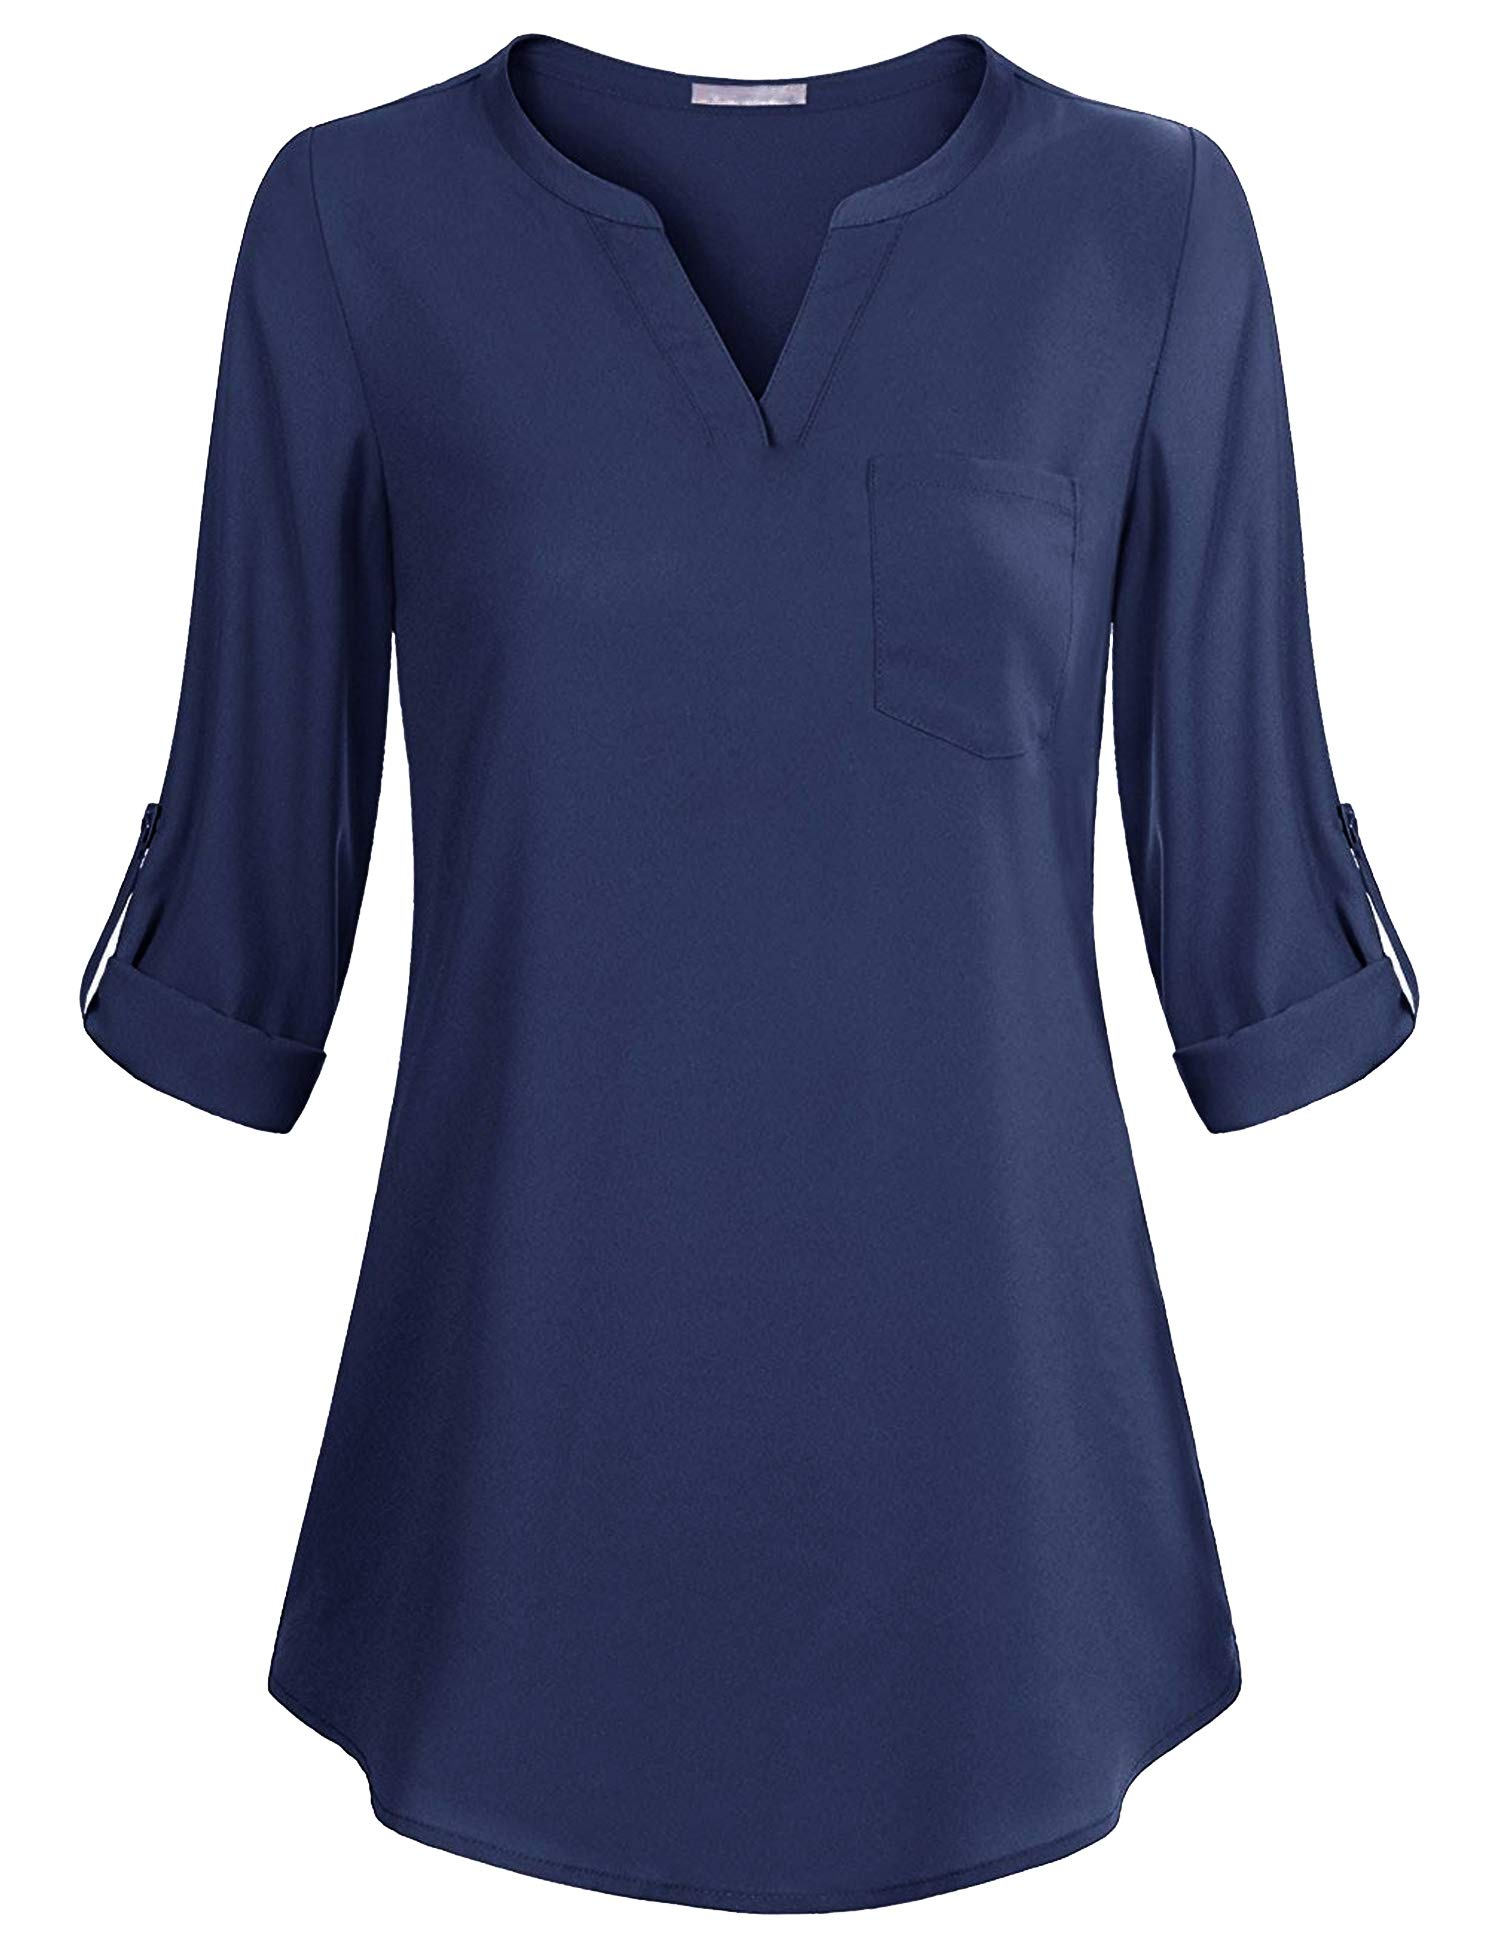 Mofavor Women's Chiffon V Neck Blouse Cuffed 3/4 Sleeve Tunic Tops